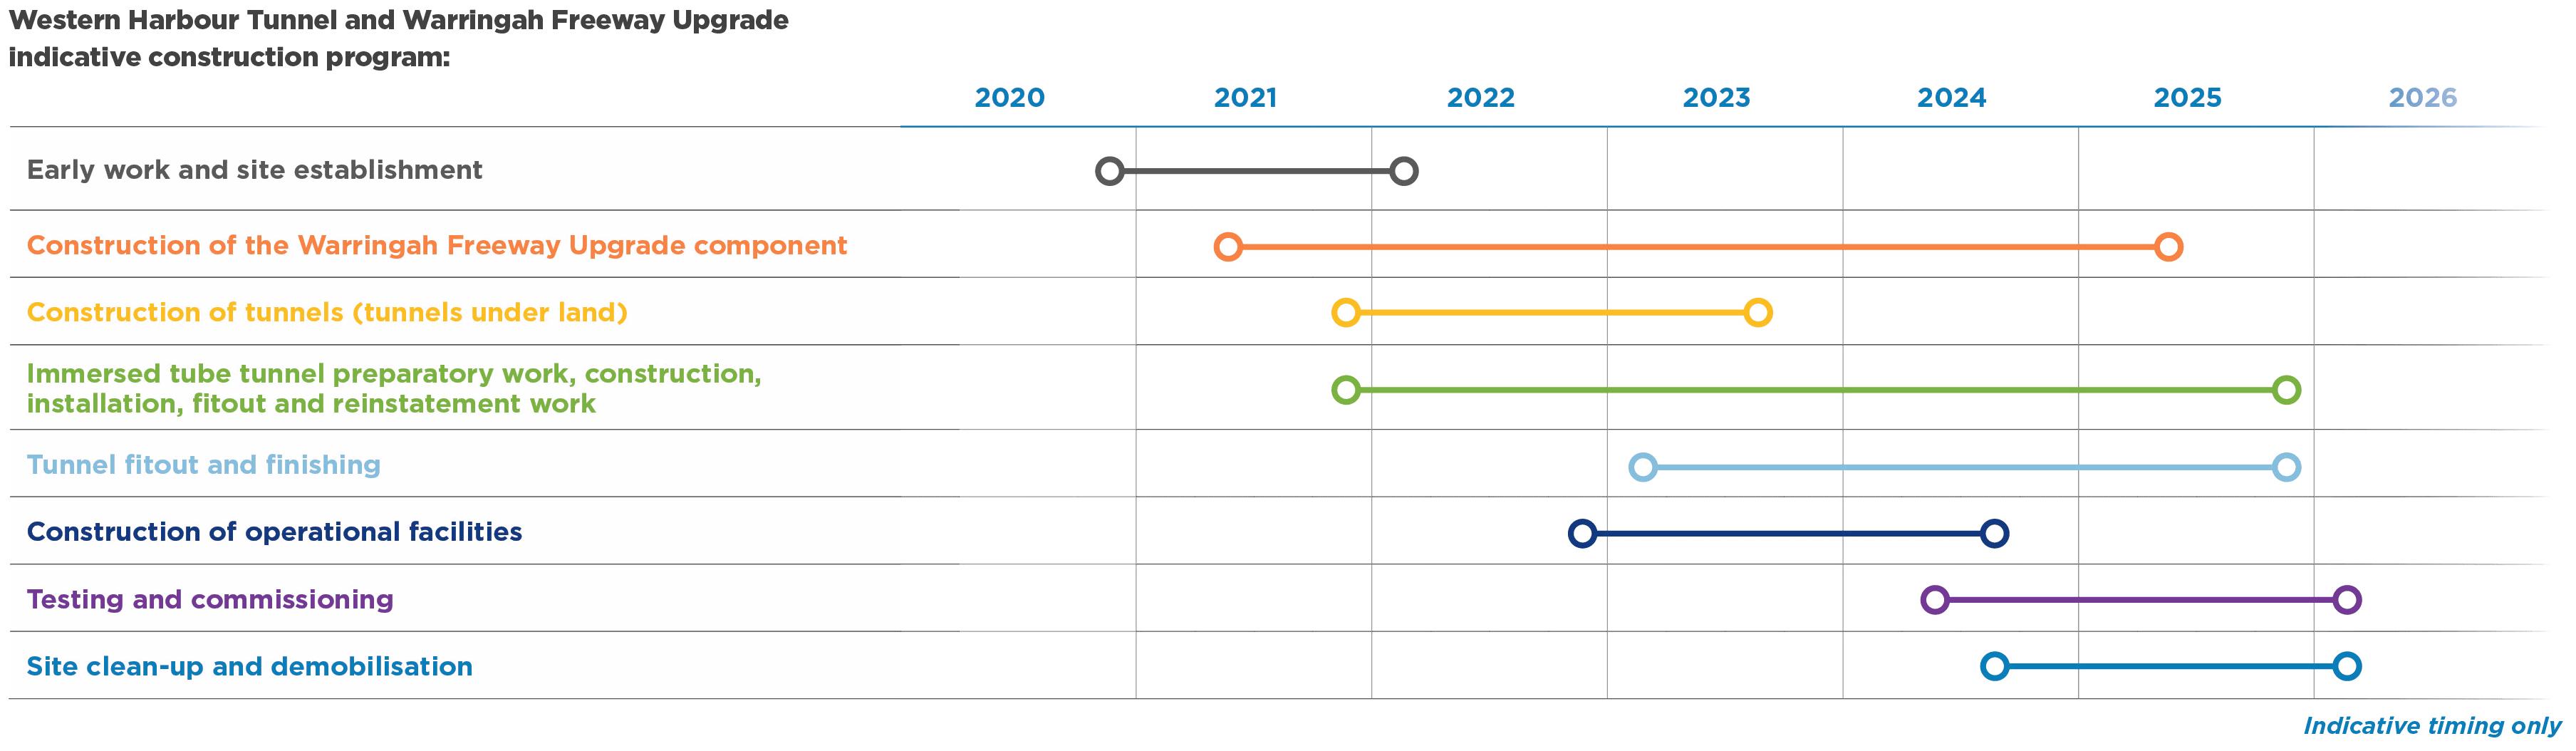 Project construction timeline